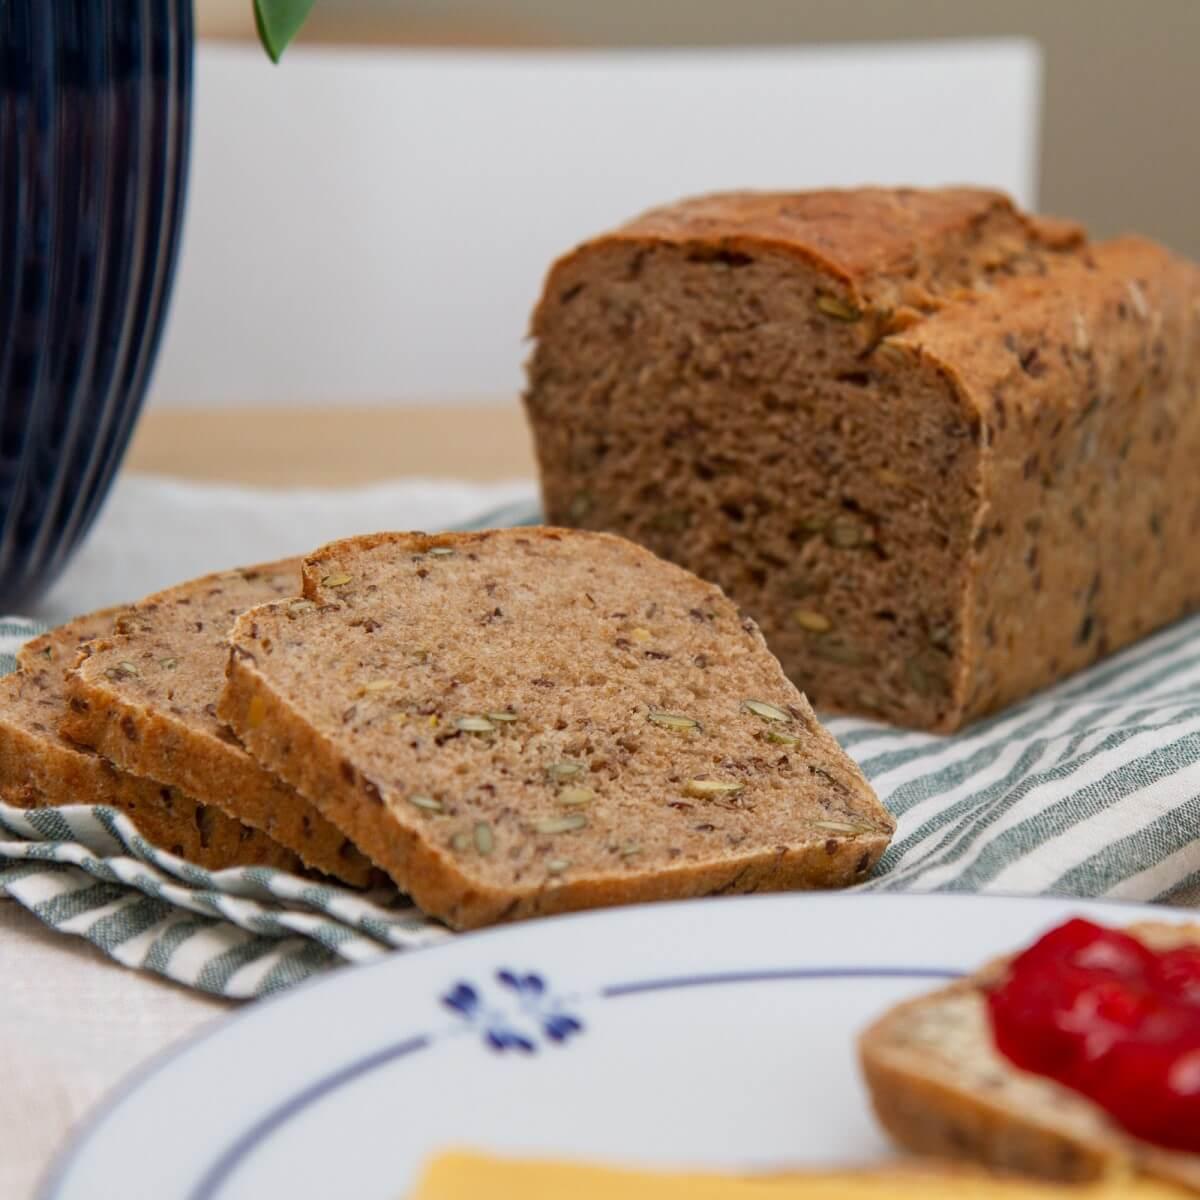 Grovbrød med rug og gresskarkjerner